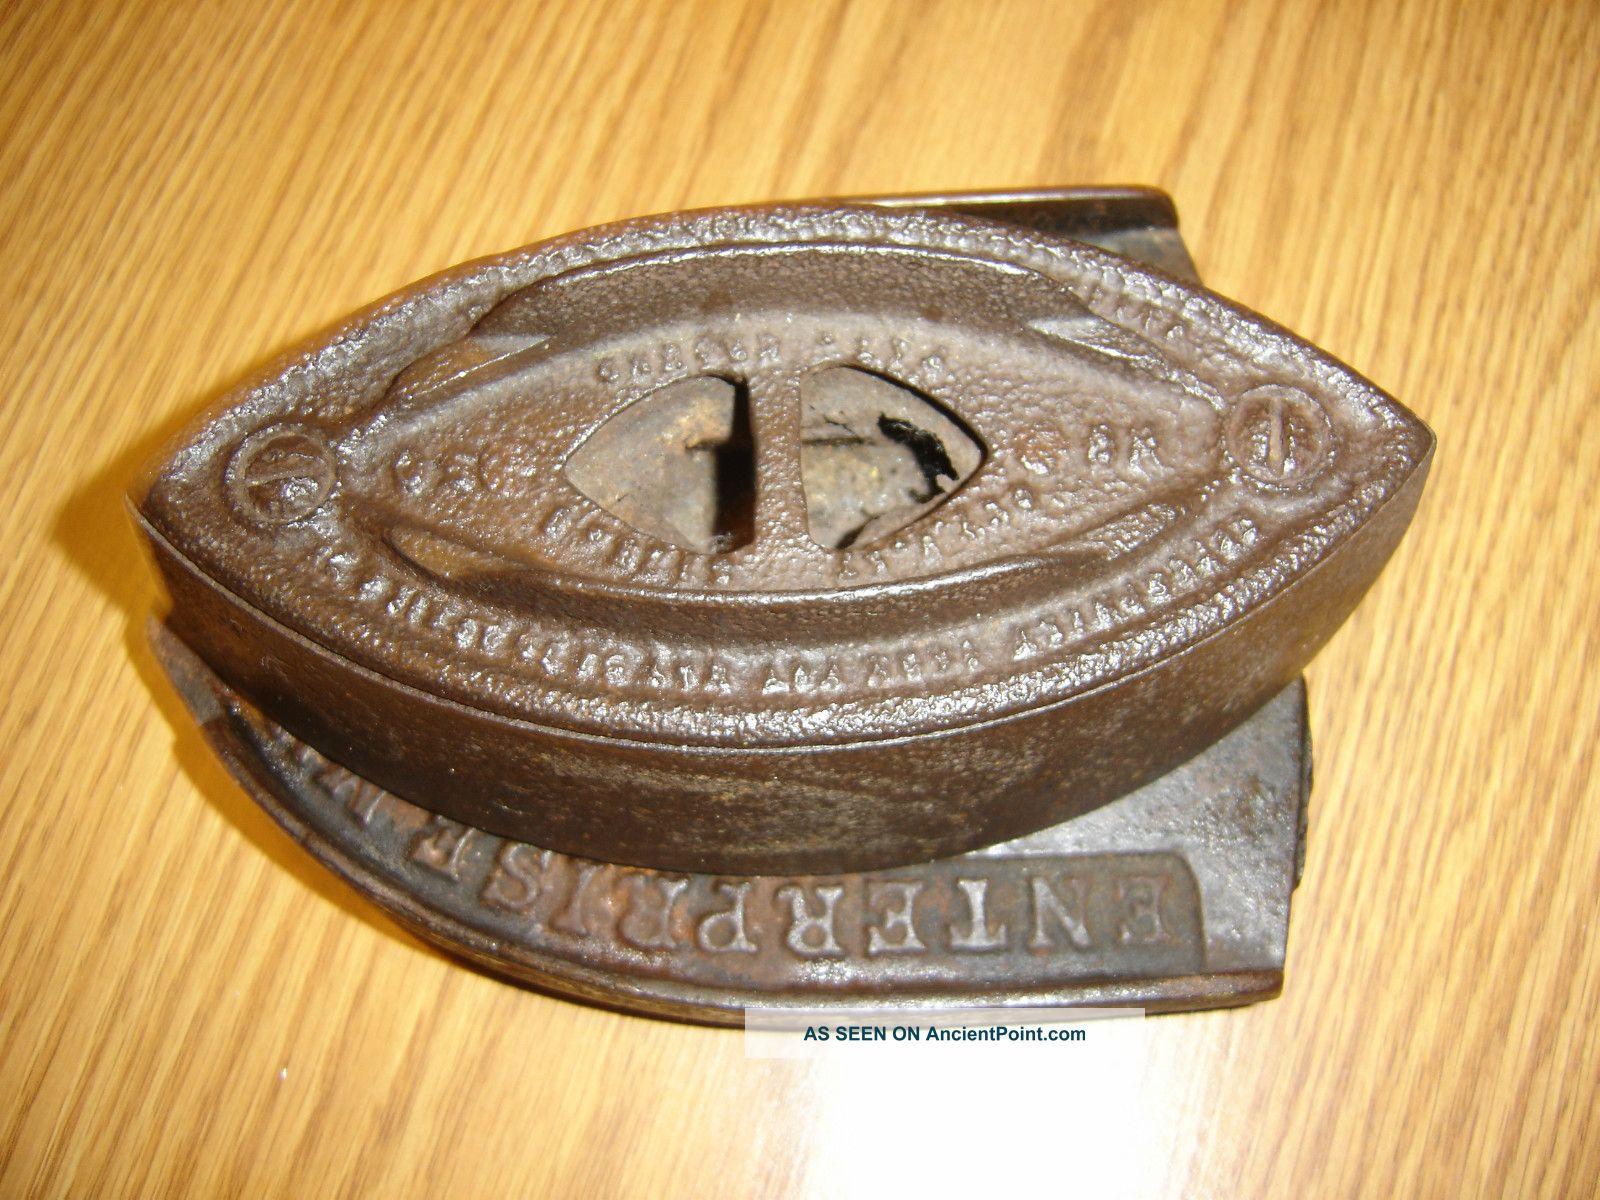 Antique Enterprise Mfg Co Philadelphia Usa,  Sad Iron And Trivet Trivets photo